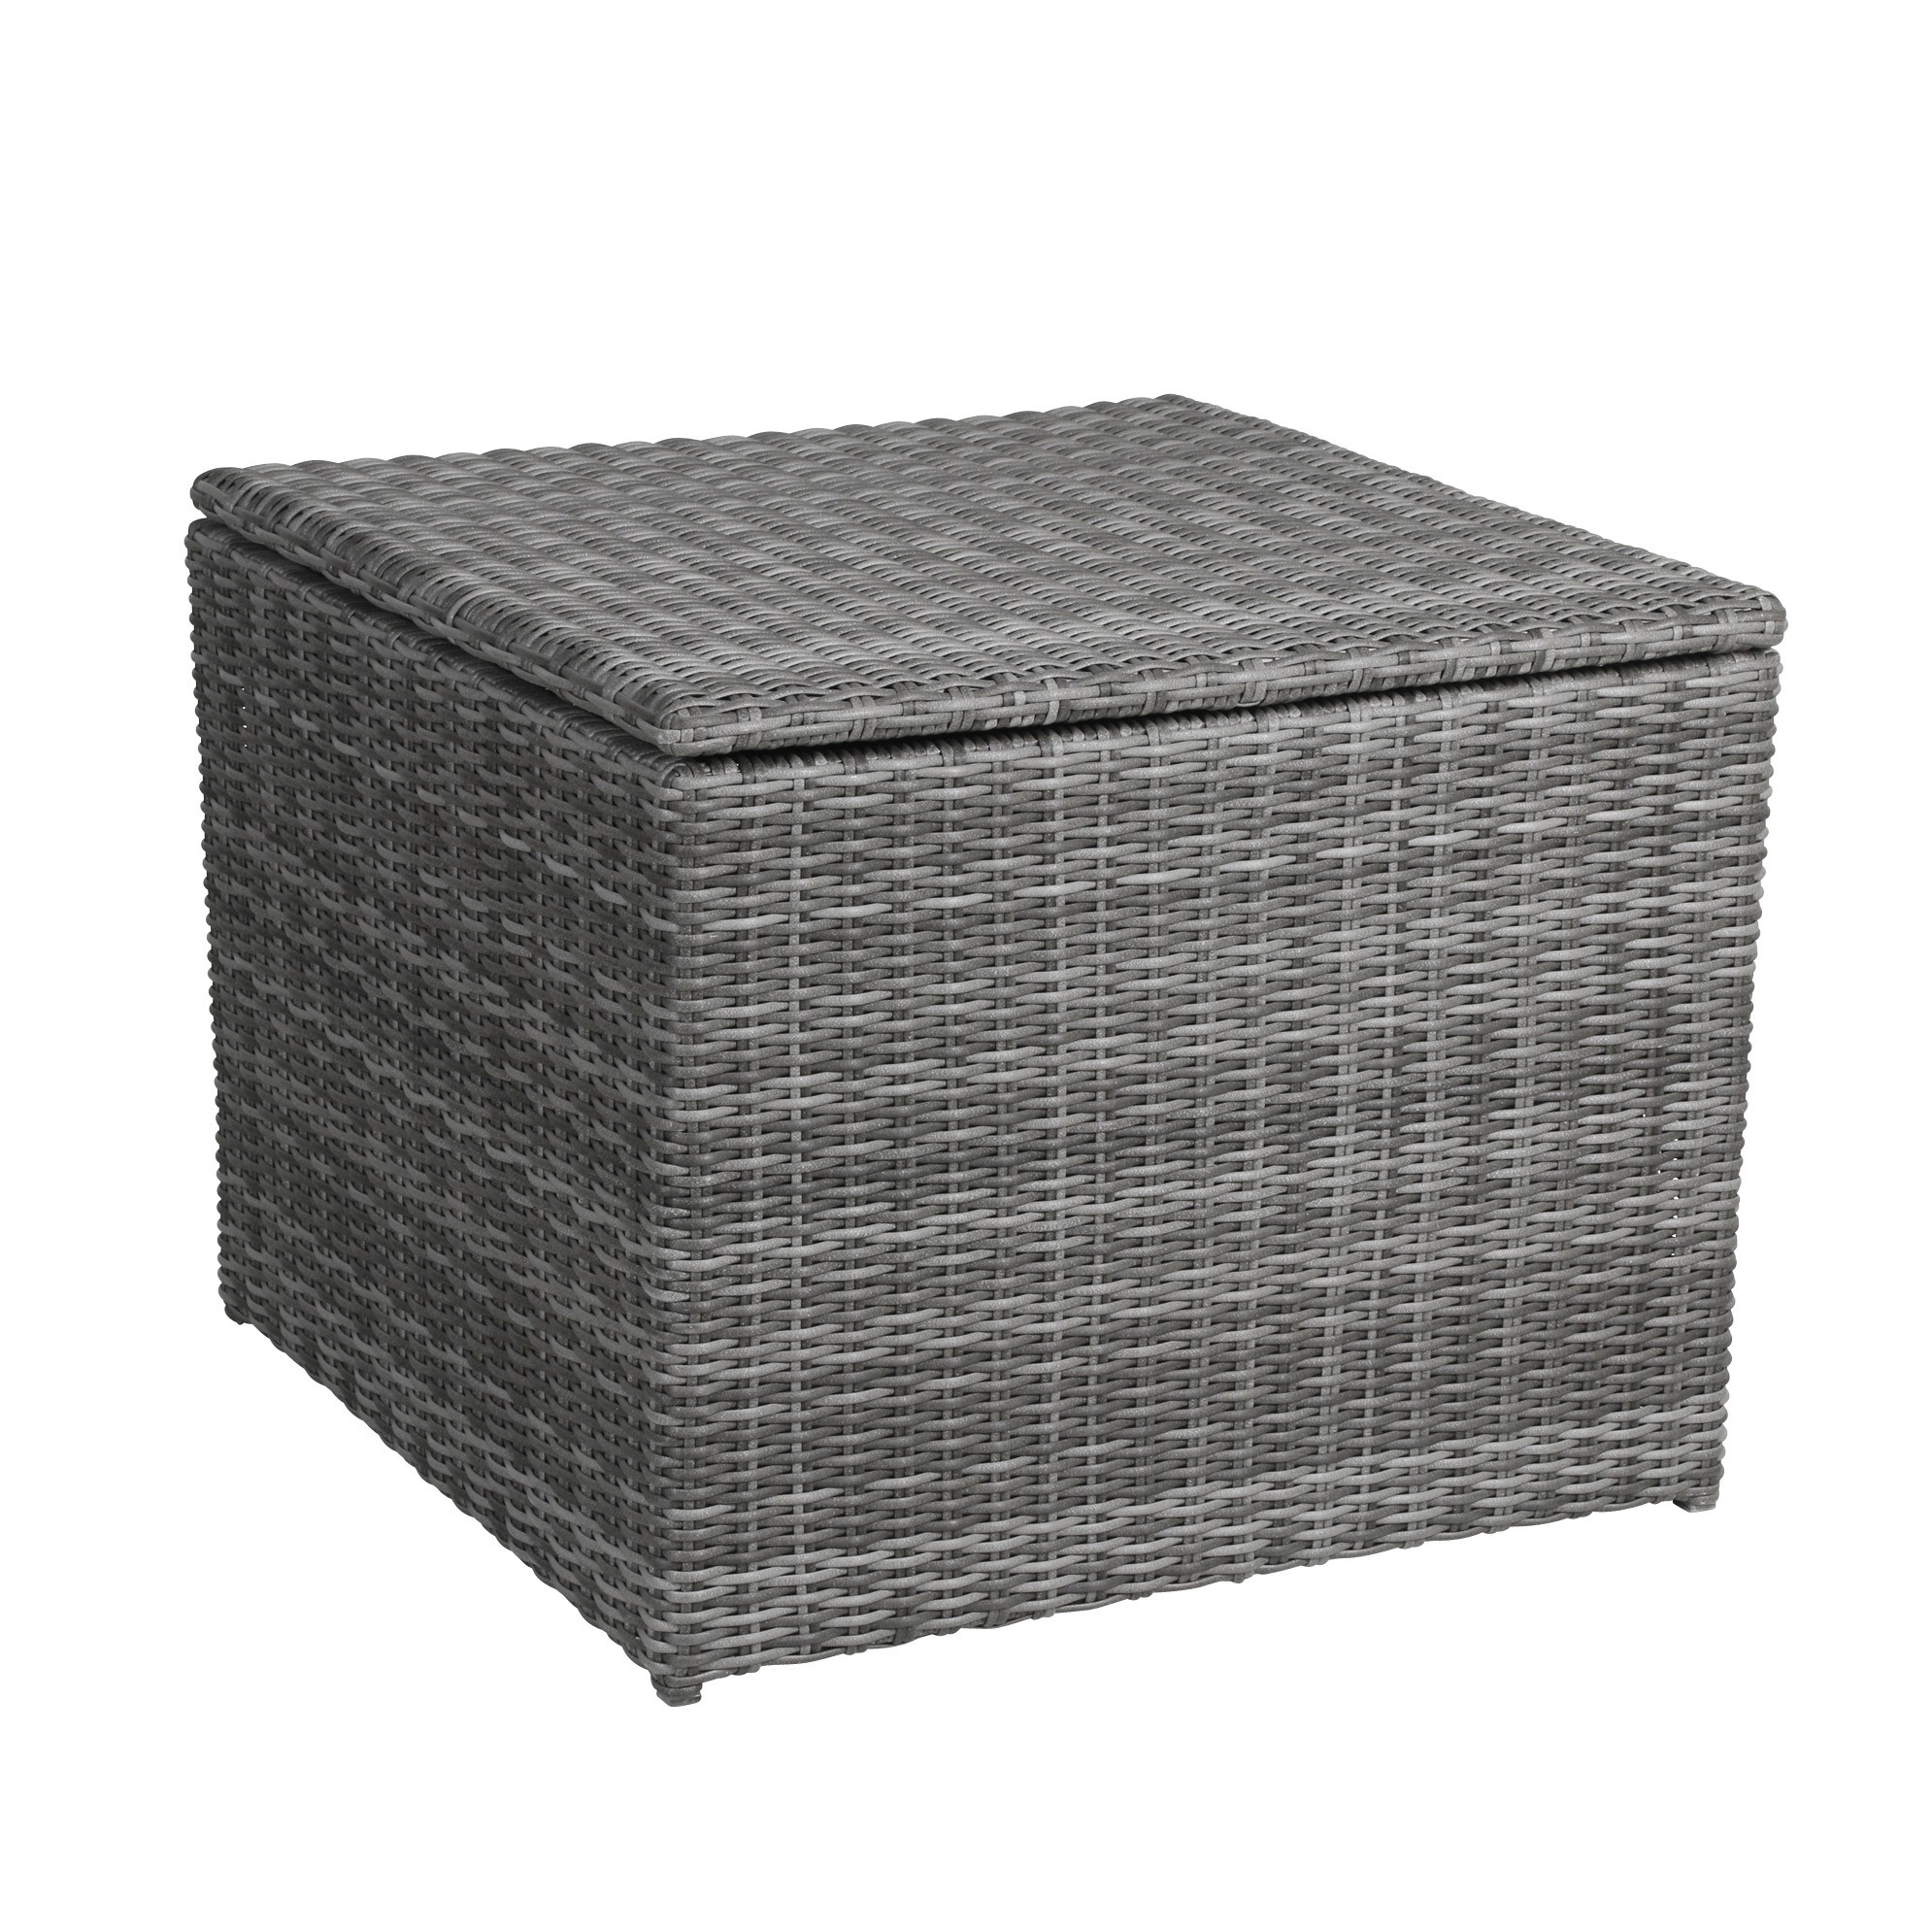 Kissenbox /  Auflagenbox Bari greemotion Polyrattan grau 80x80cm Bild 1